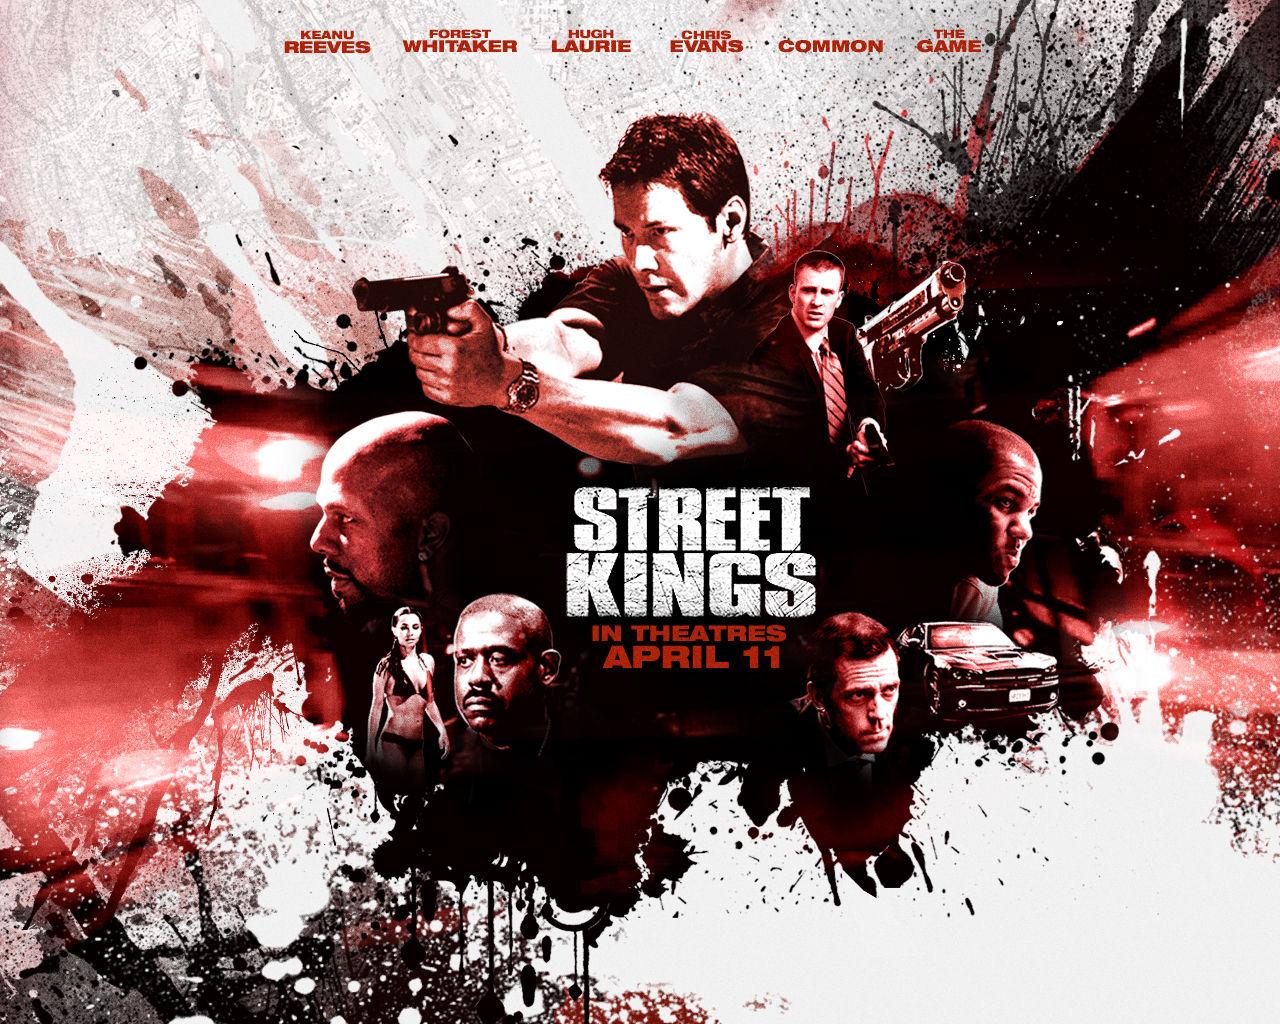 http://4.bp.blogspot.com/-N9UIg3502WQ/TrabC9jepnI/AAAAAAAAAg8/fapZms6Hnnk/s1600/street_kings01.jpg